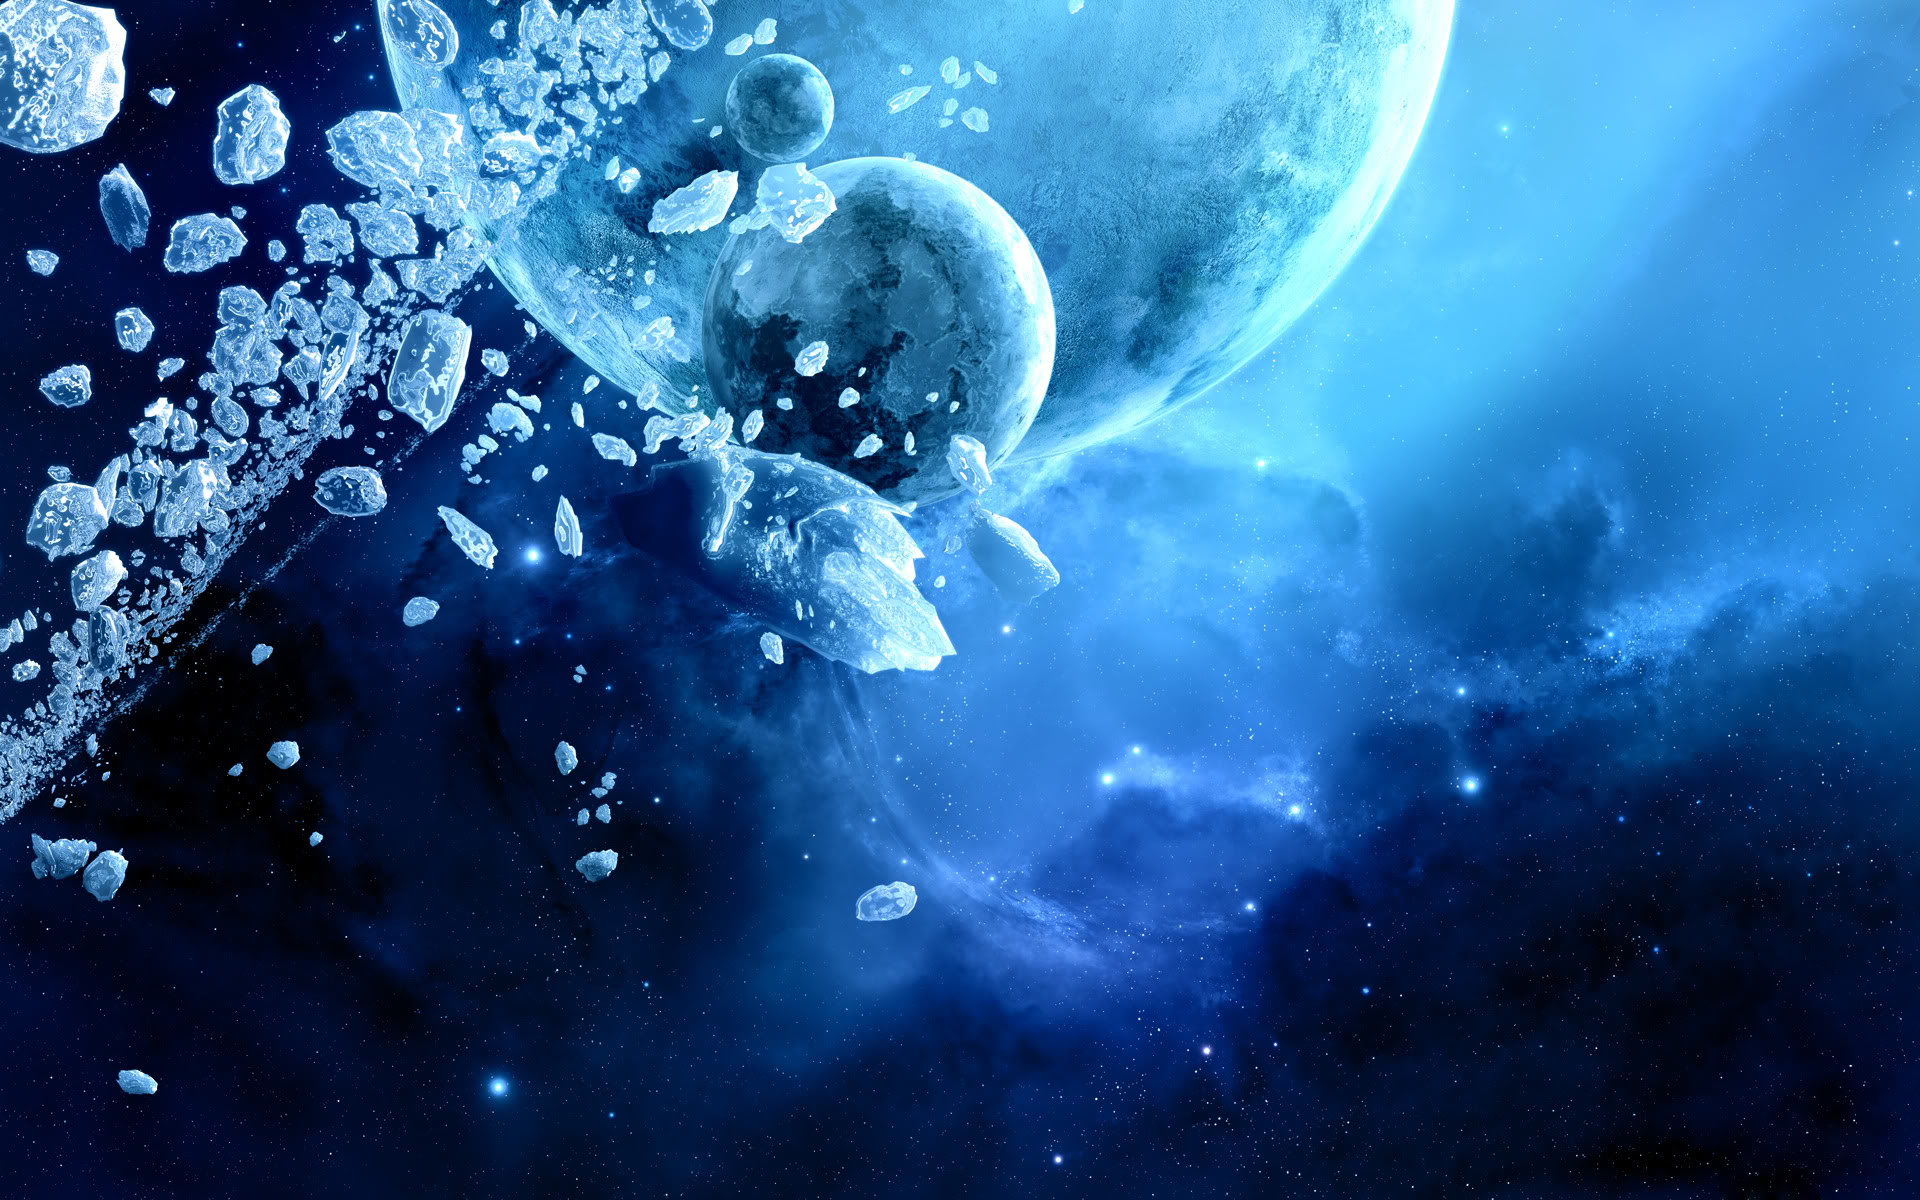 quality Glacialis HD Science Fiction Sci fi wallpaper 1920x1200 1920x1200